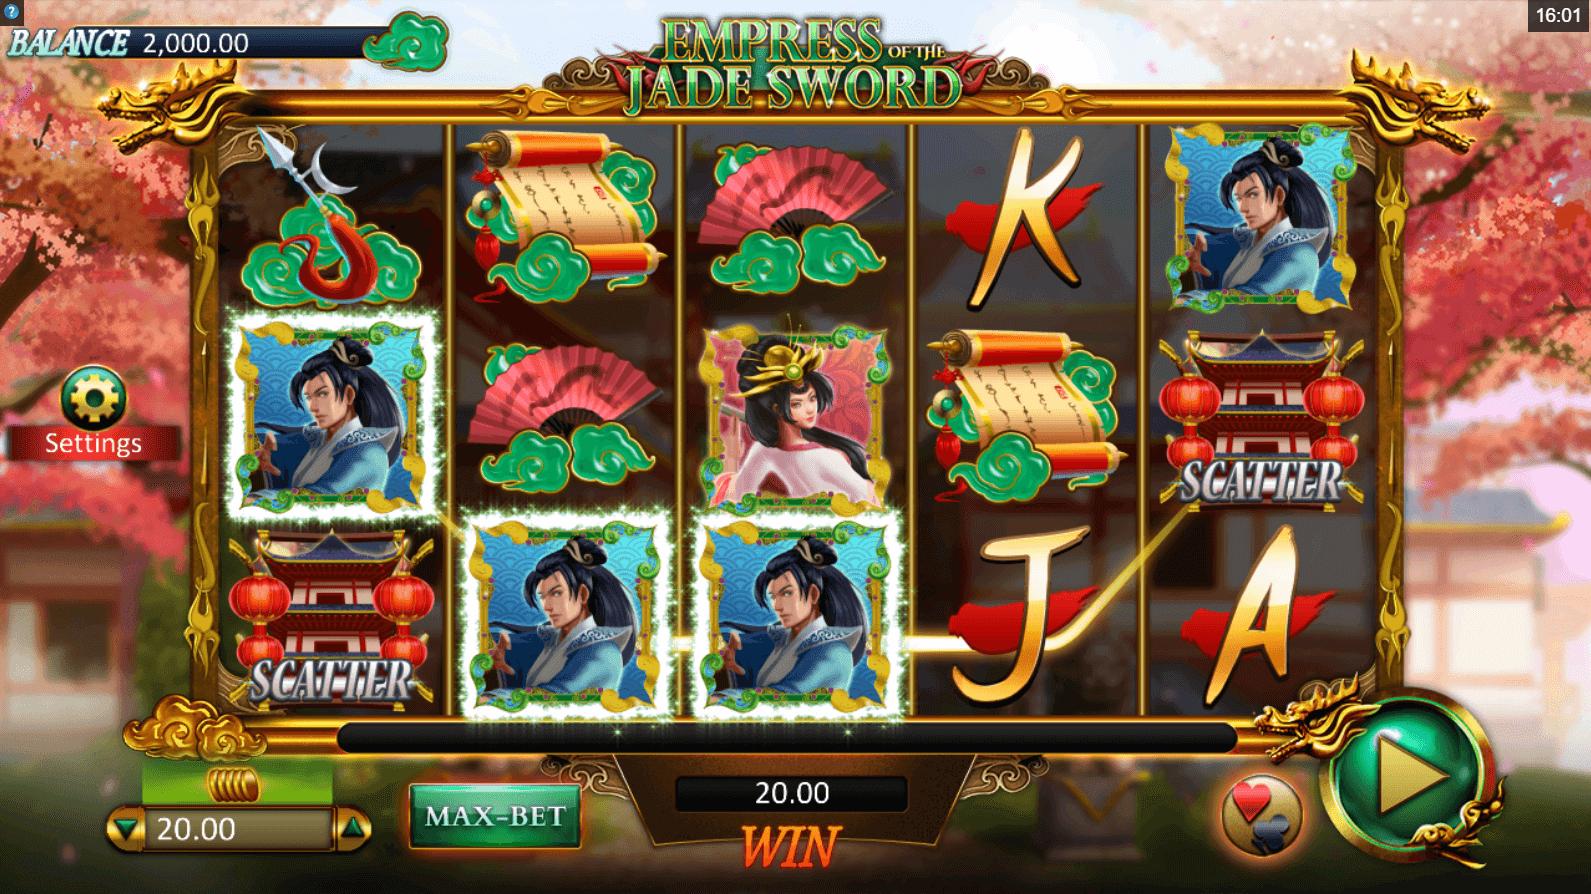 Spiele Game Of Swords - Video Slots Online